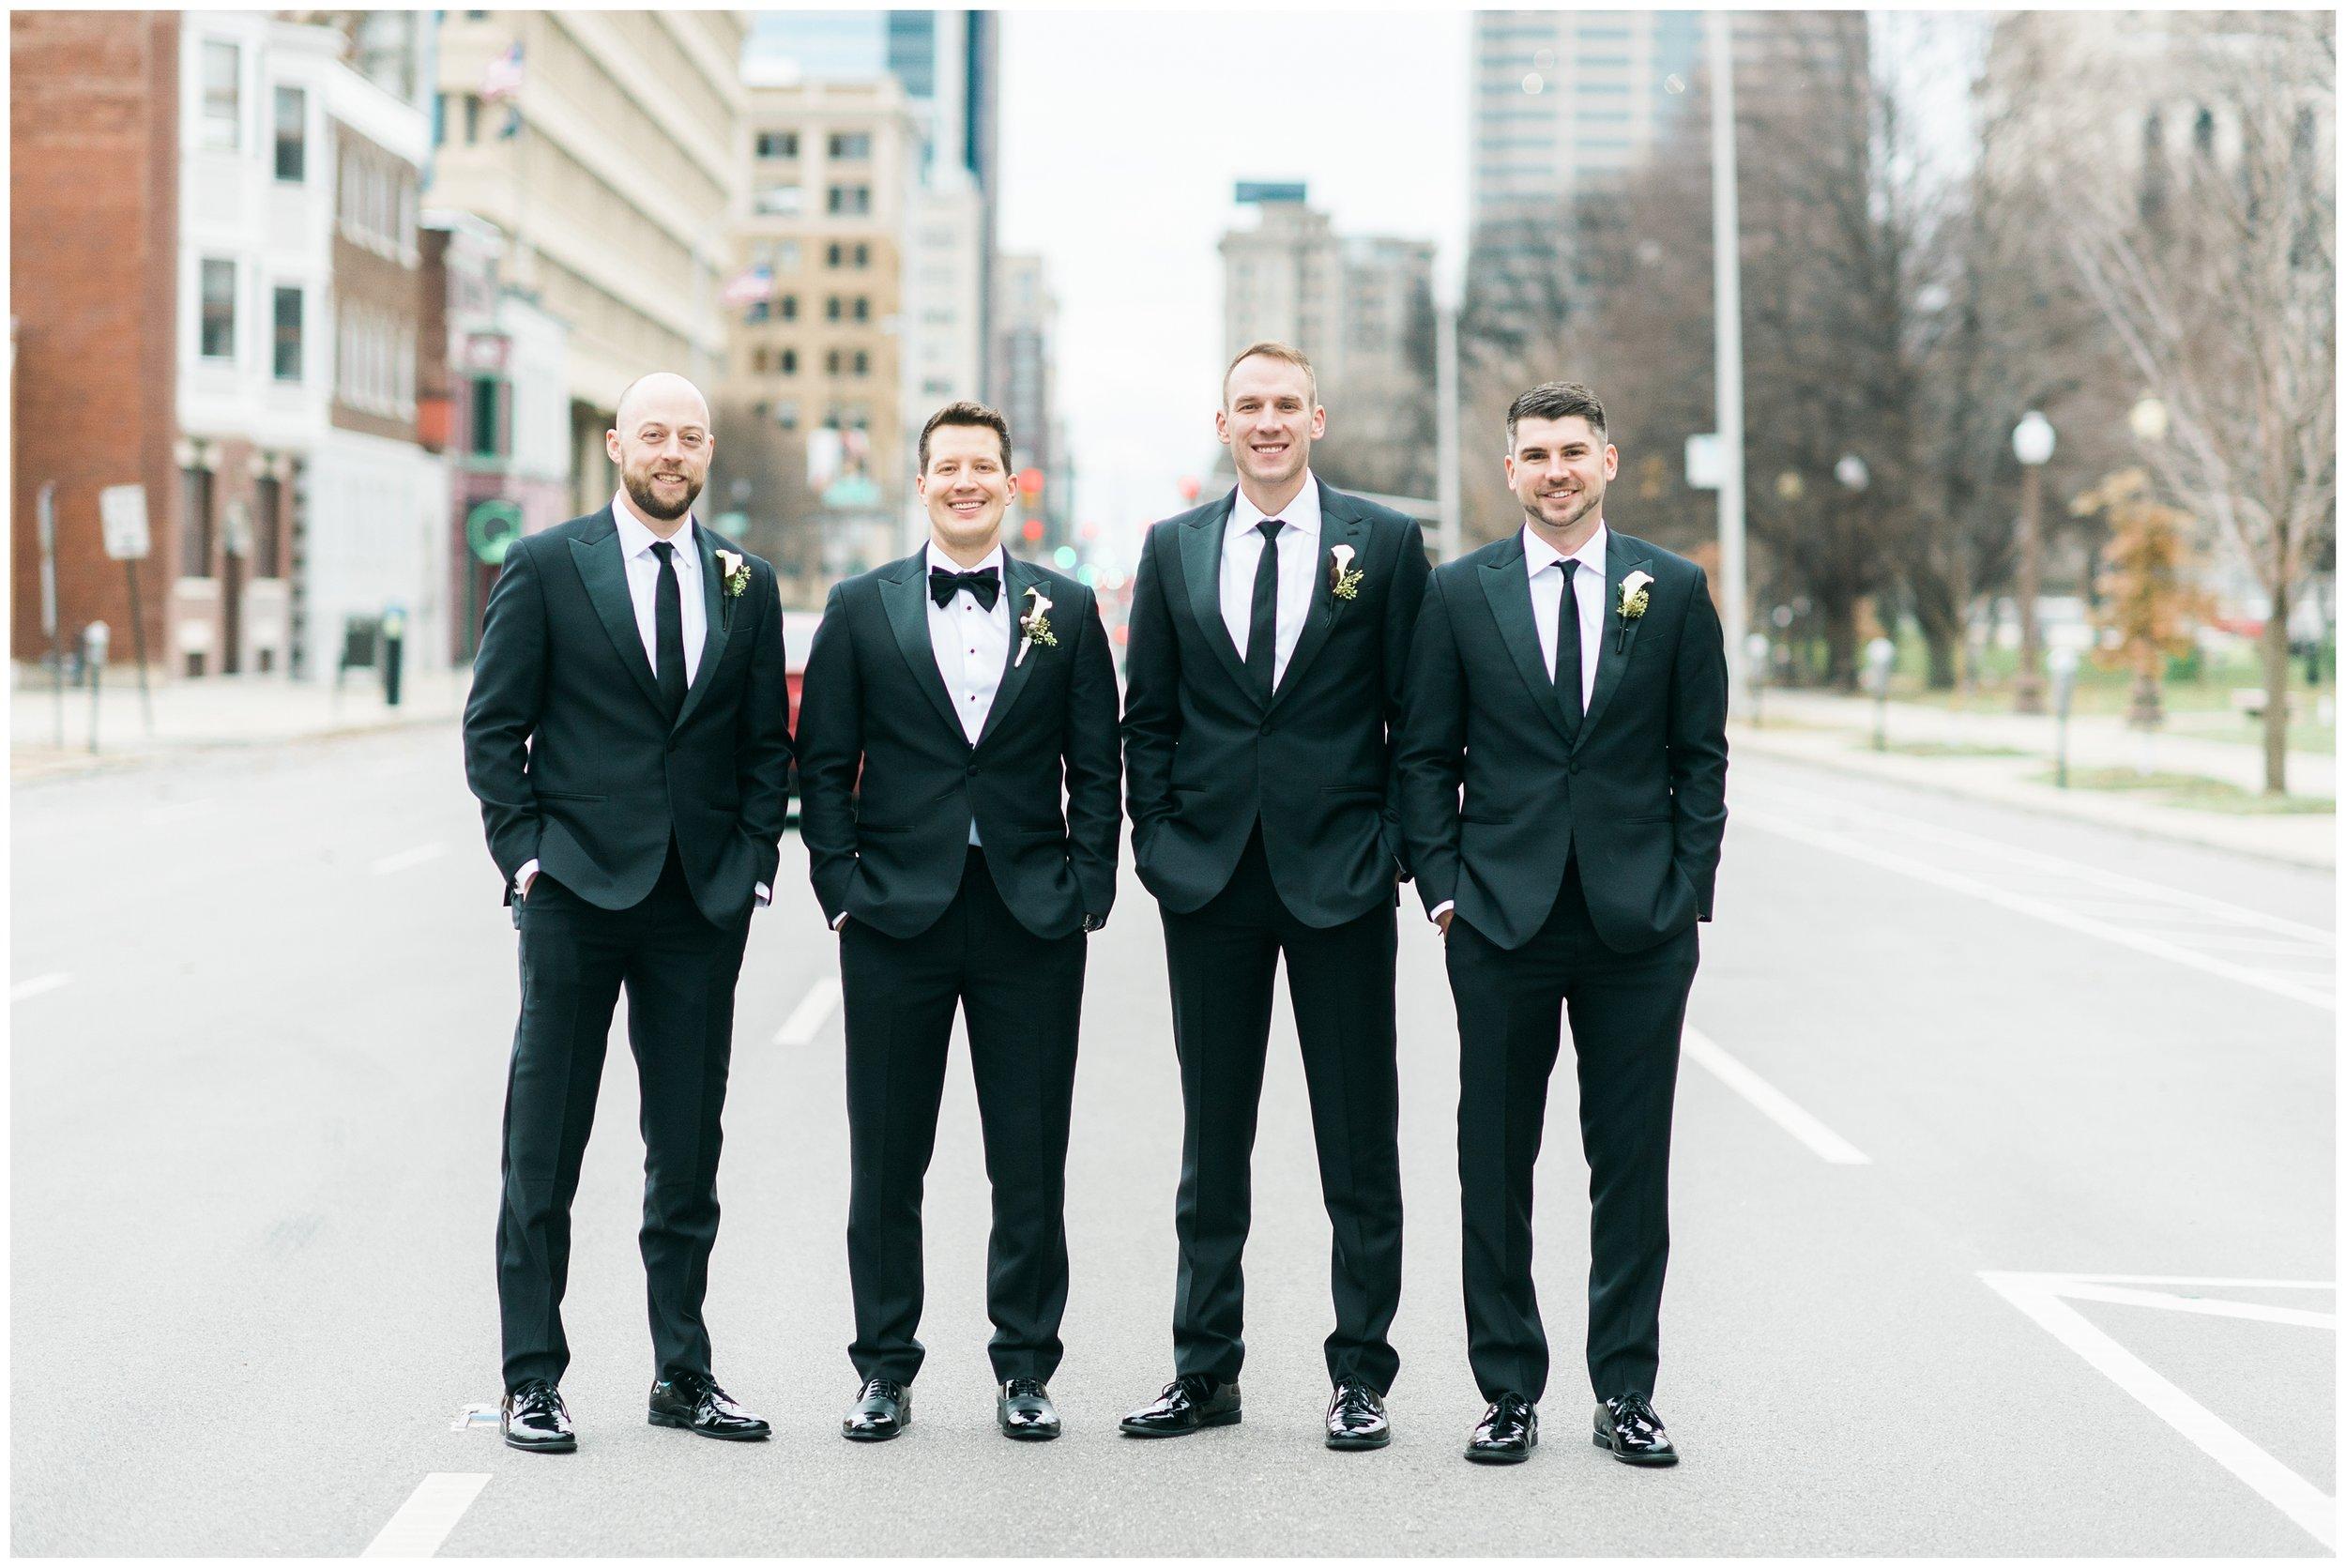 Rebecca_Bridges_Photography_Indianapolis_Wedding_Photographer_5816.jpg